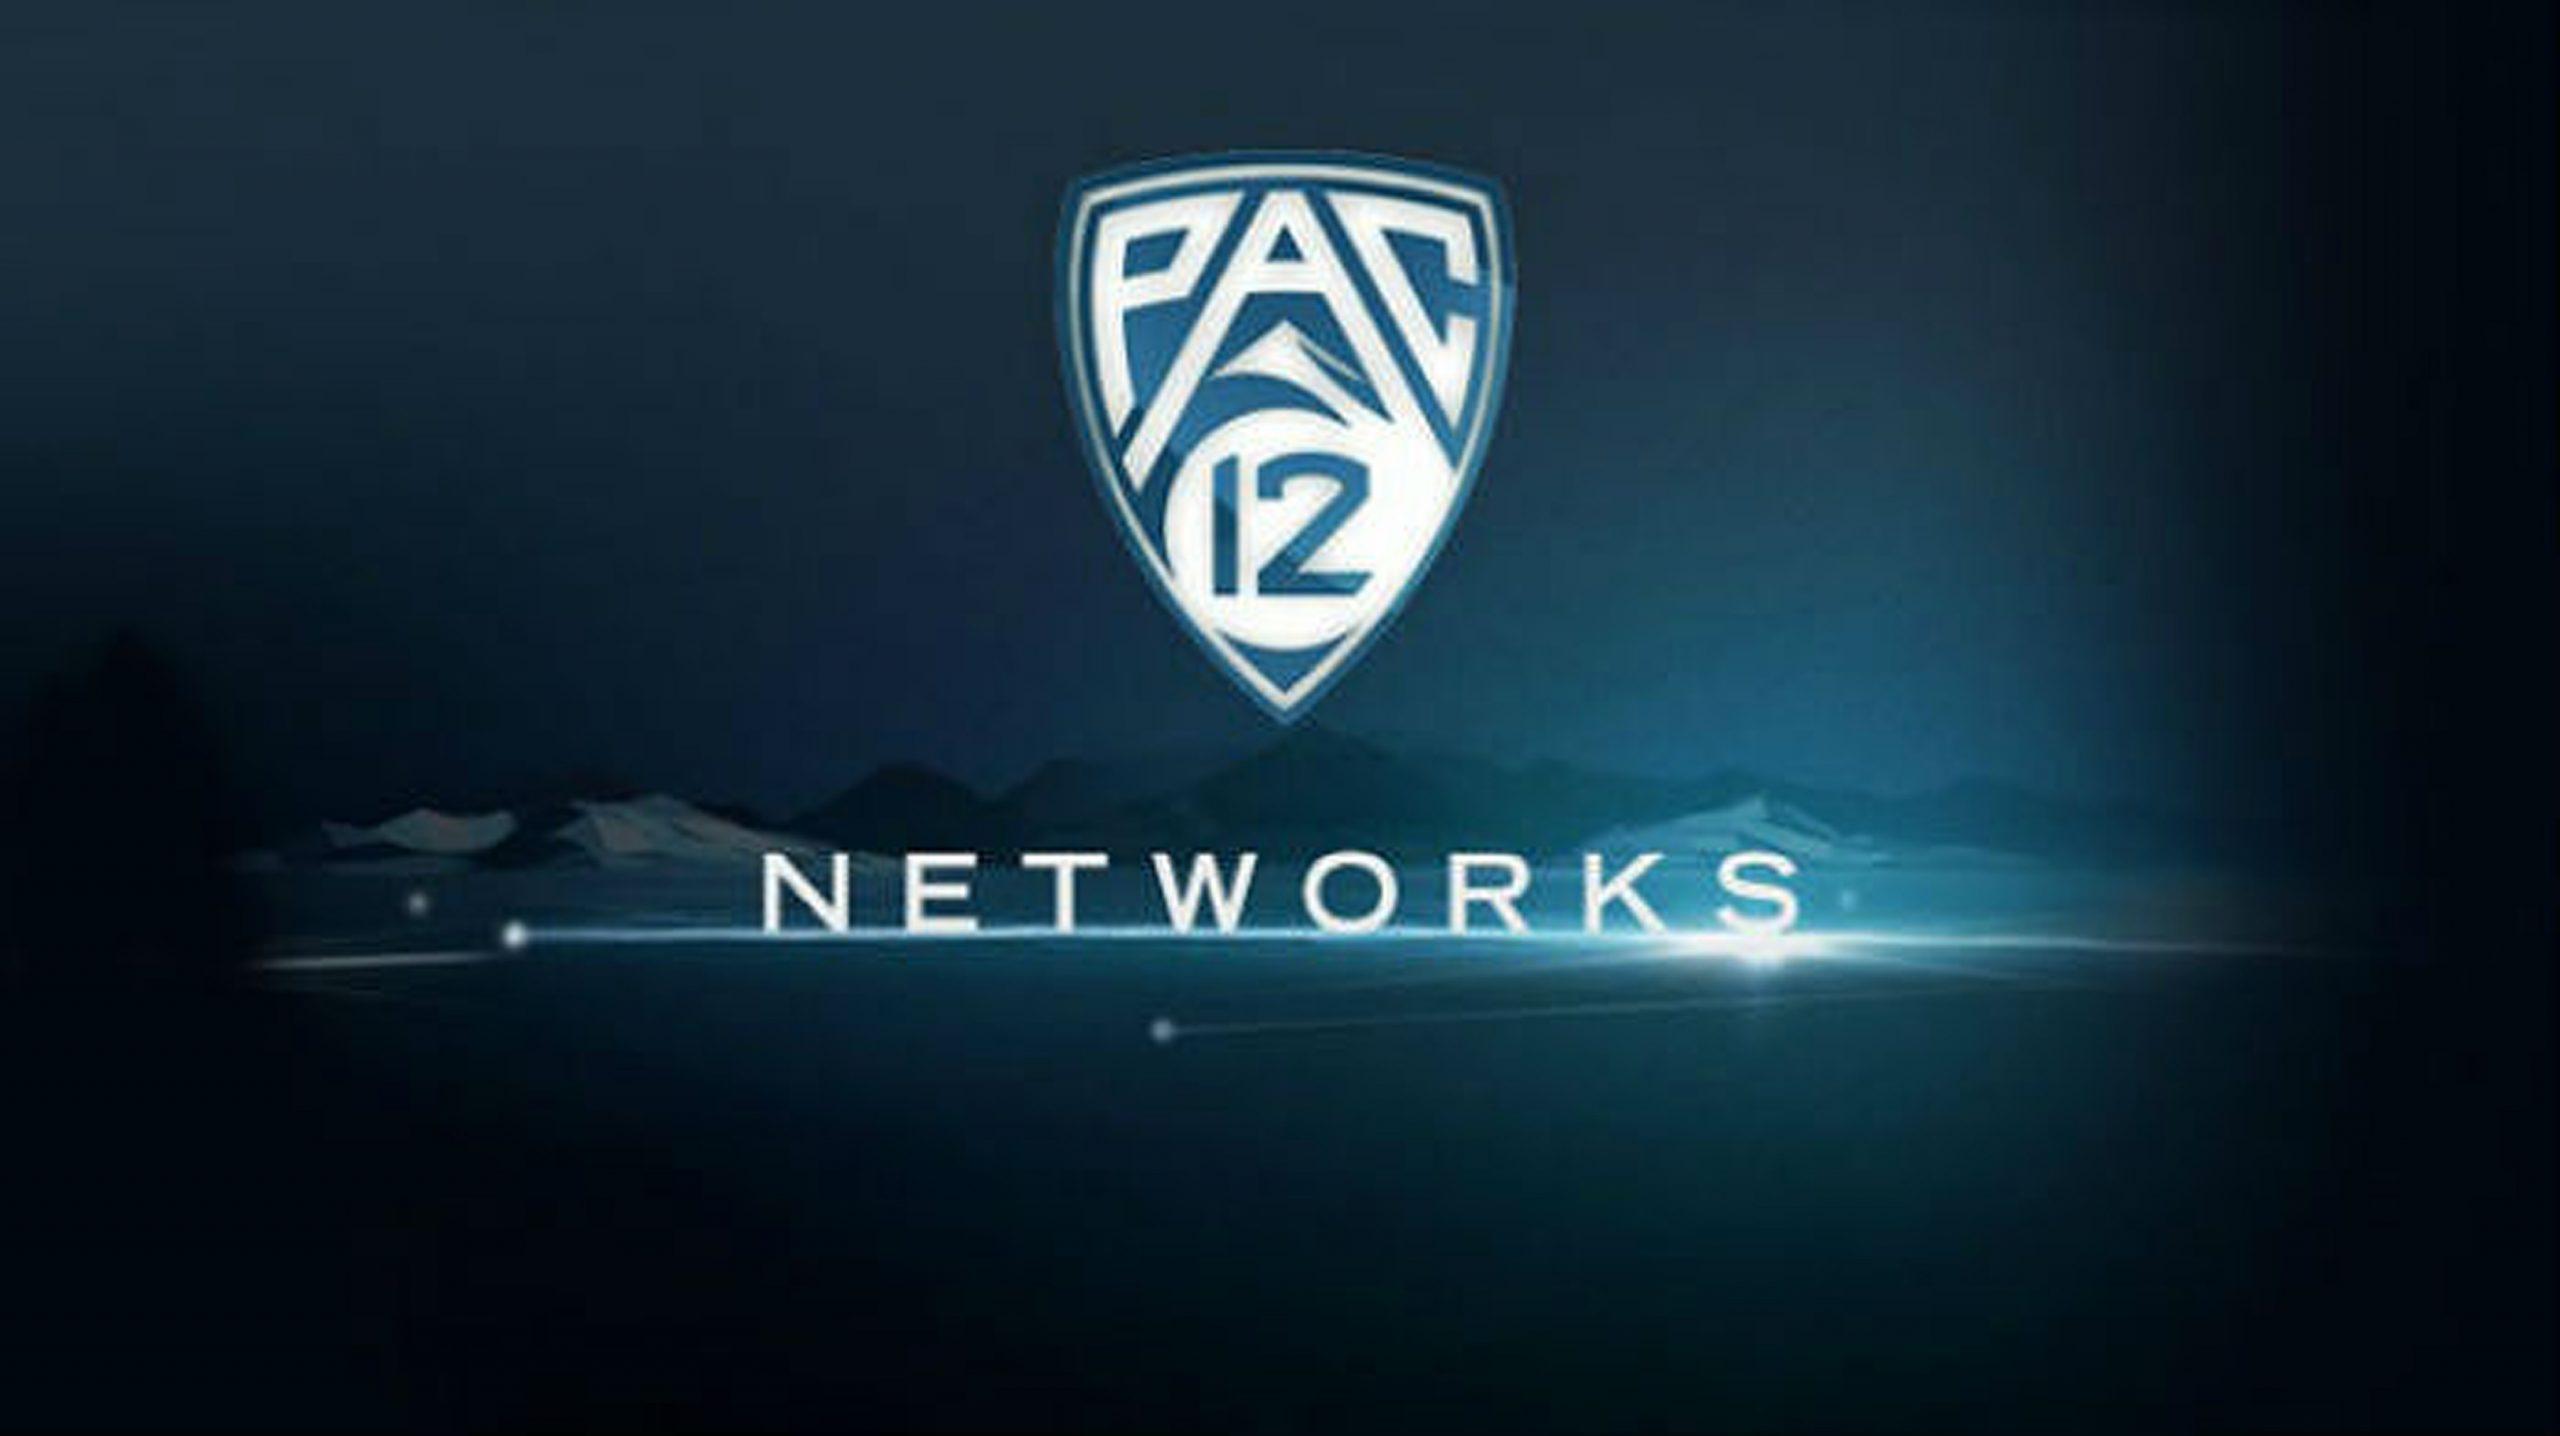 Pac-12 Networks logo.